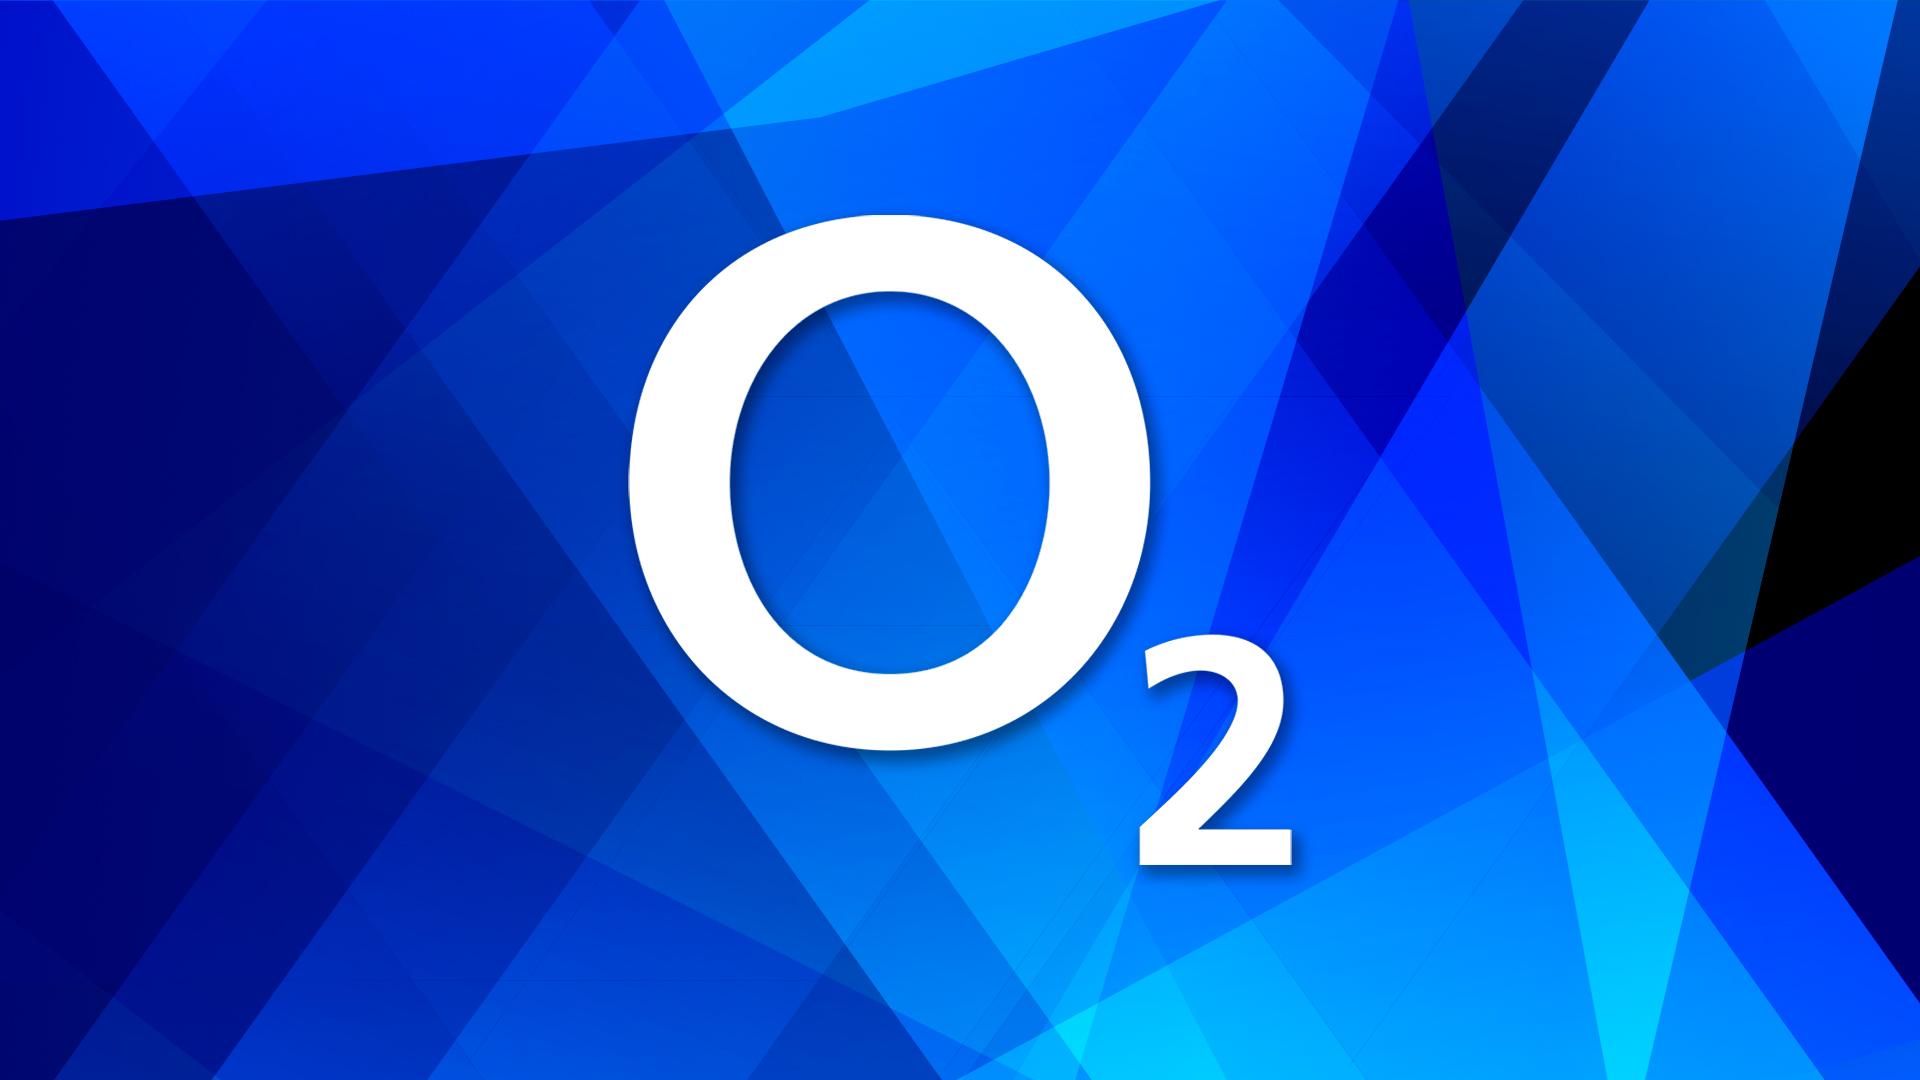 Logo, Mobilfunk, Provider, O2, Telefonica, Netzbetreiber, Mobilfunkanbieter, Mobilfunkbetreiber, Isp, Telekommunikationsunternehmen, Mobilfunktarif, O2 Free, Telefonica Germany, O2 Logo